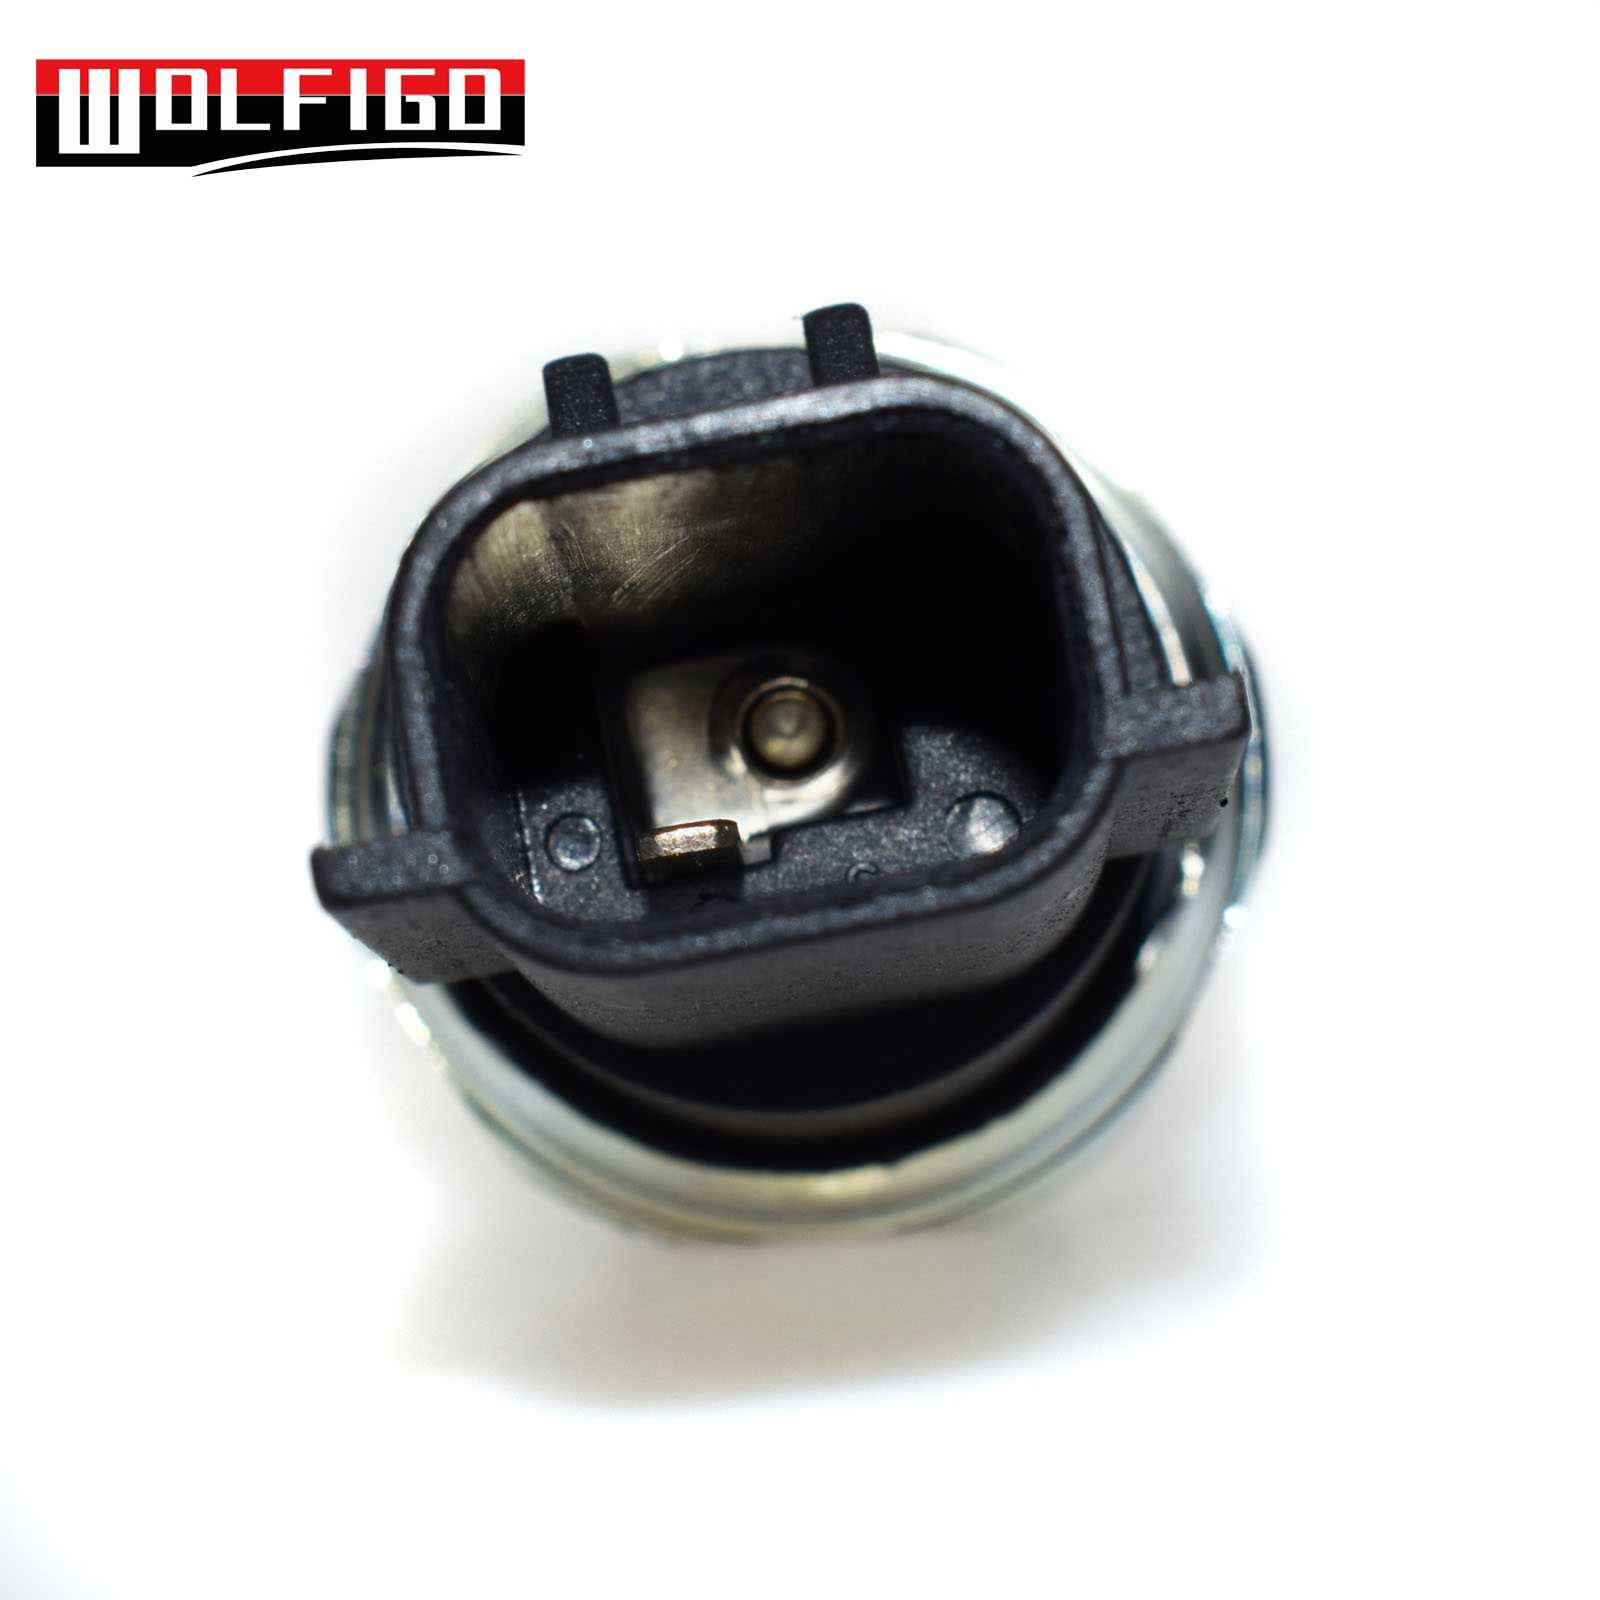 medium resolution of  wolfigo new engine oil pressure switch sender for dodge neon voyager chrysler ps287t ps287